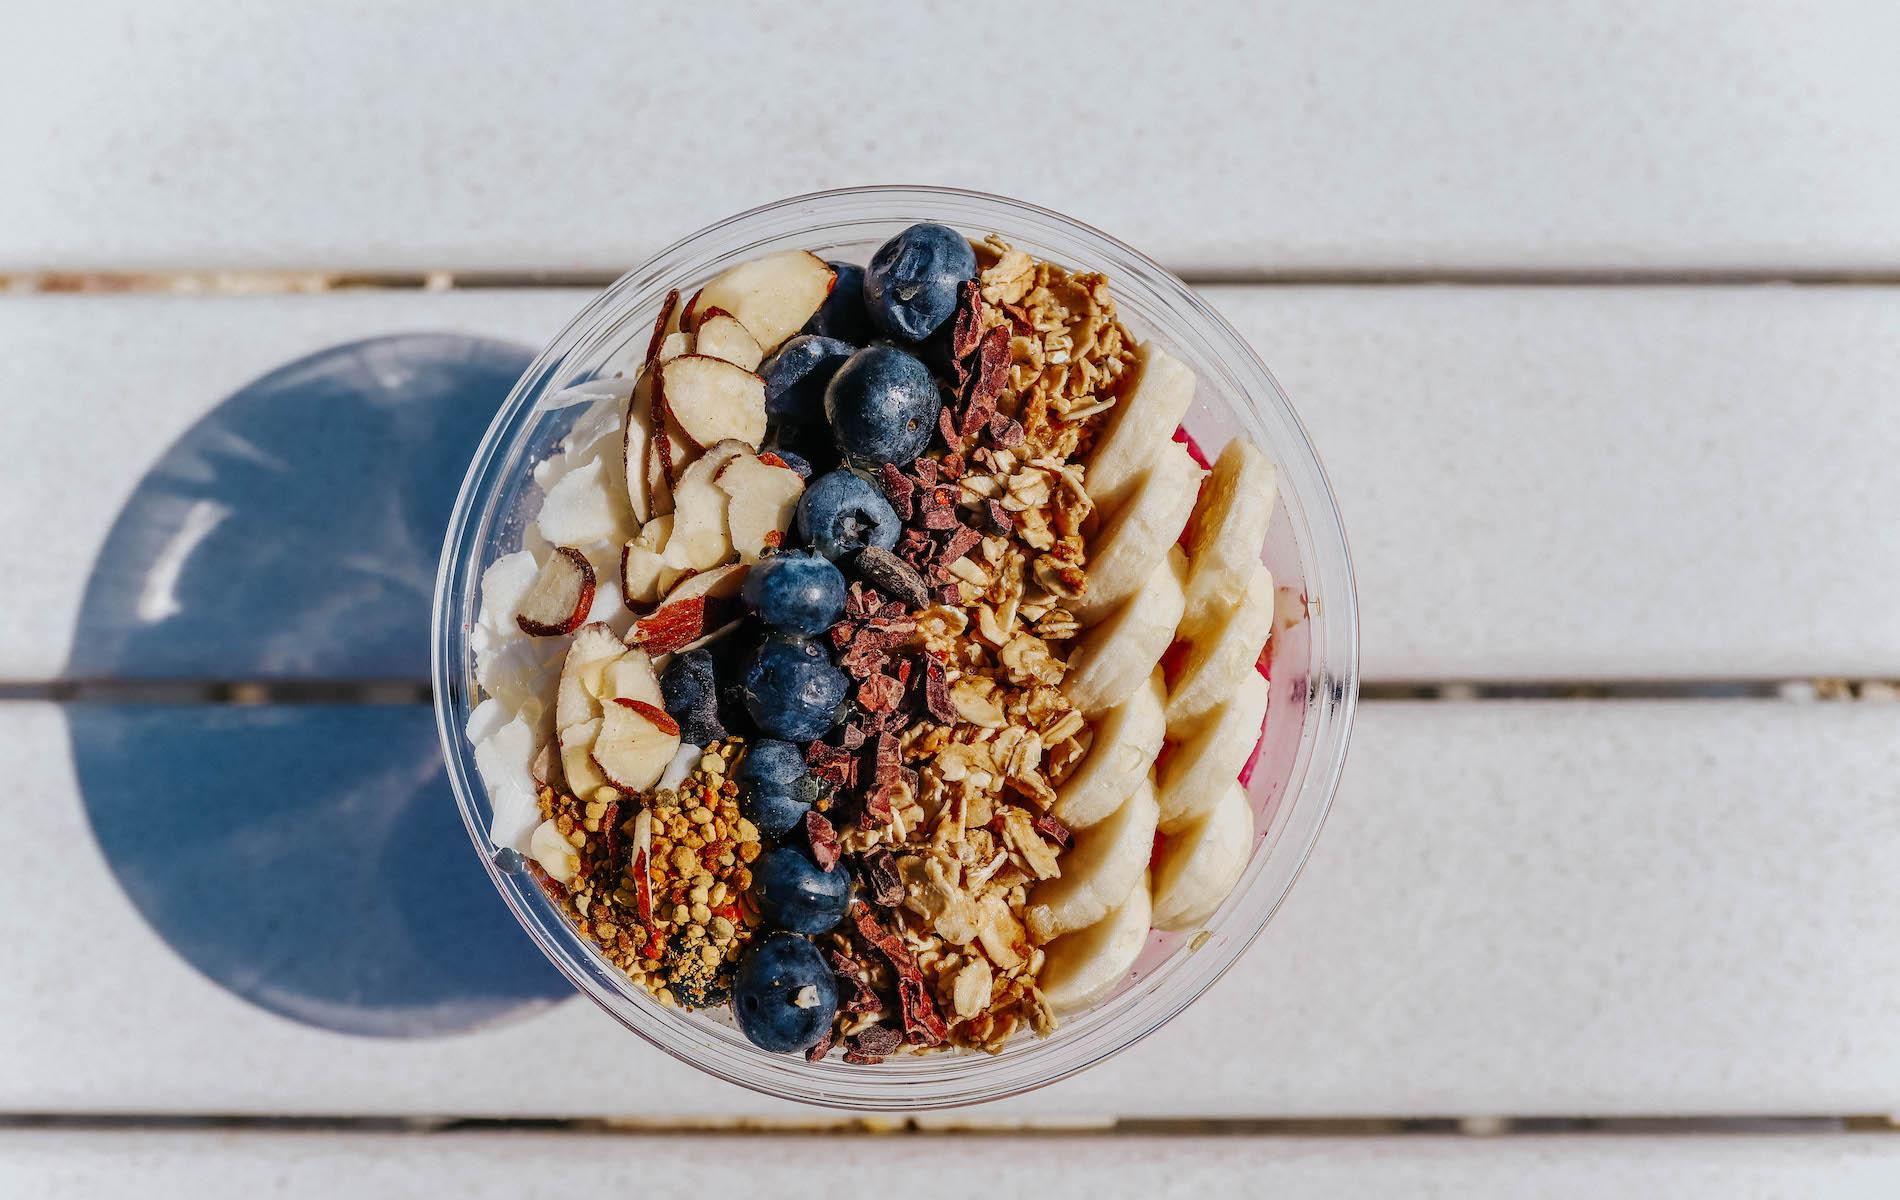 Green Stream, Seaside FL, health food, smoothie bowls, food trucks